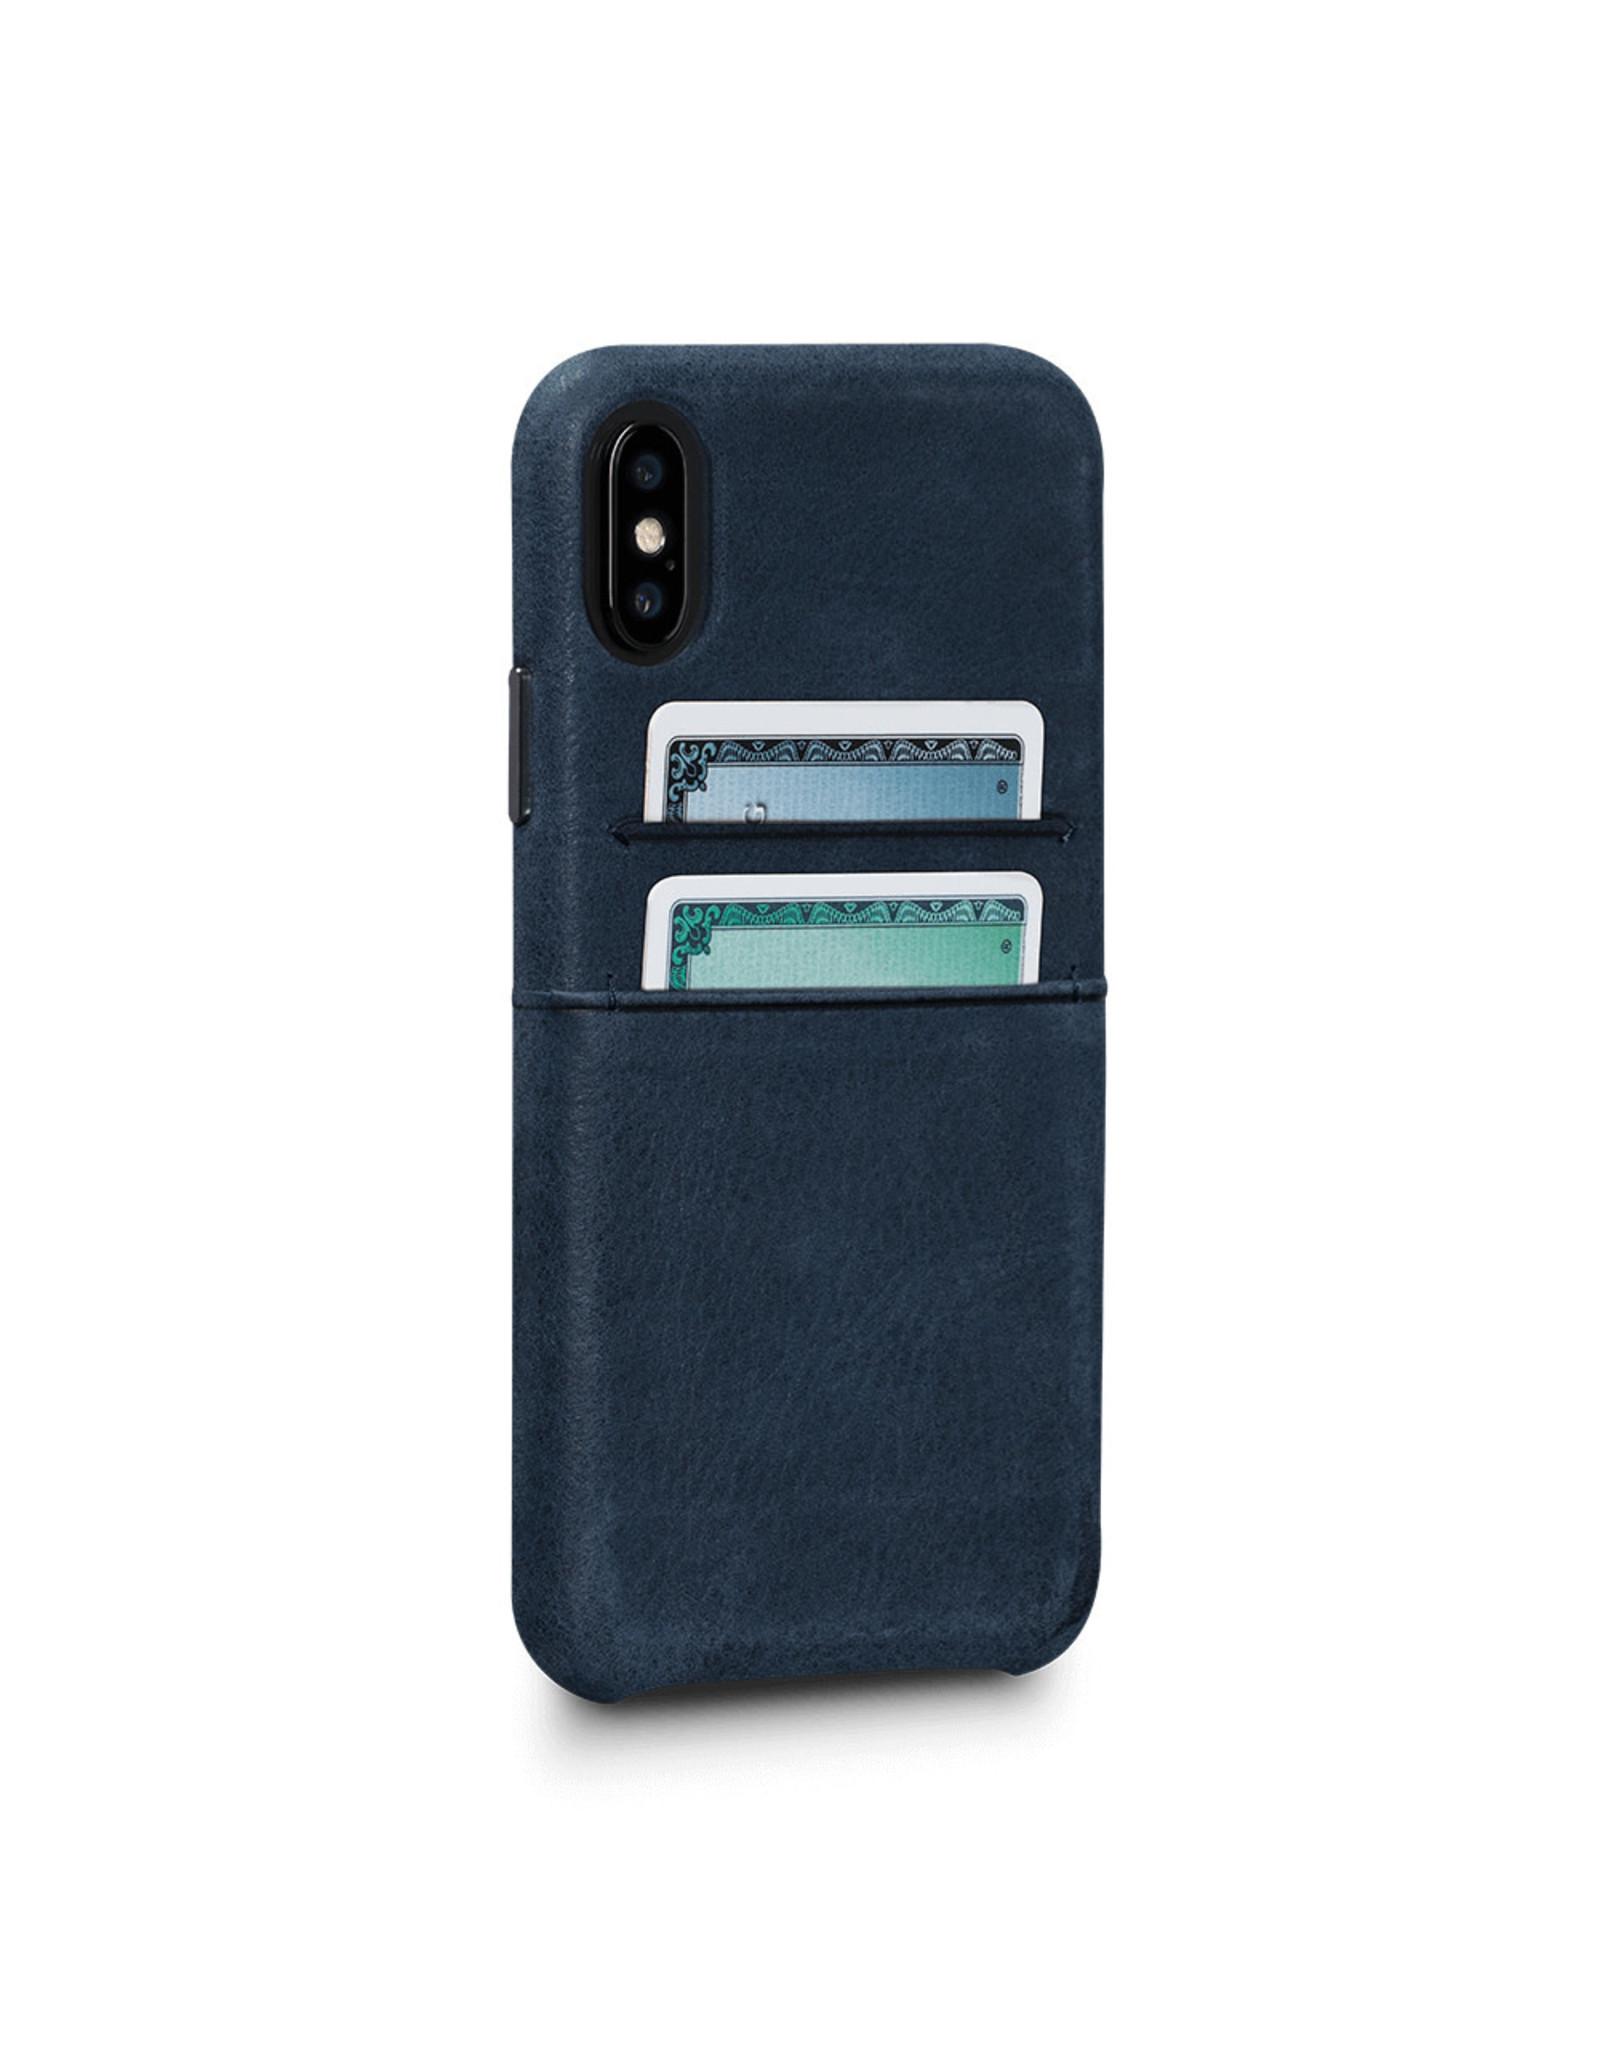 Sena Sena Bence Snap-on Leather Wallet case for iPhone X - Denim Blue EOL